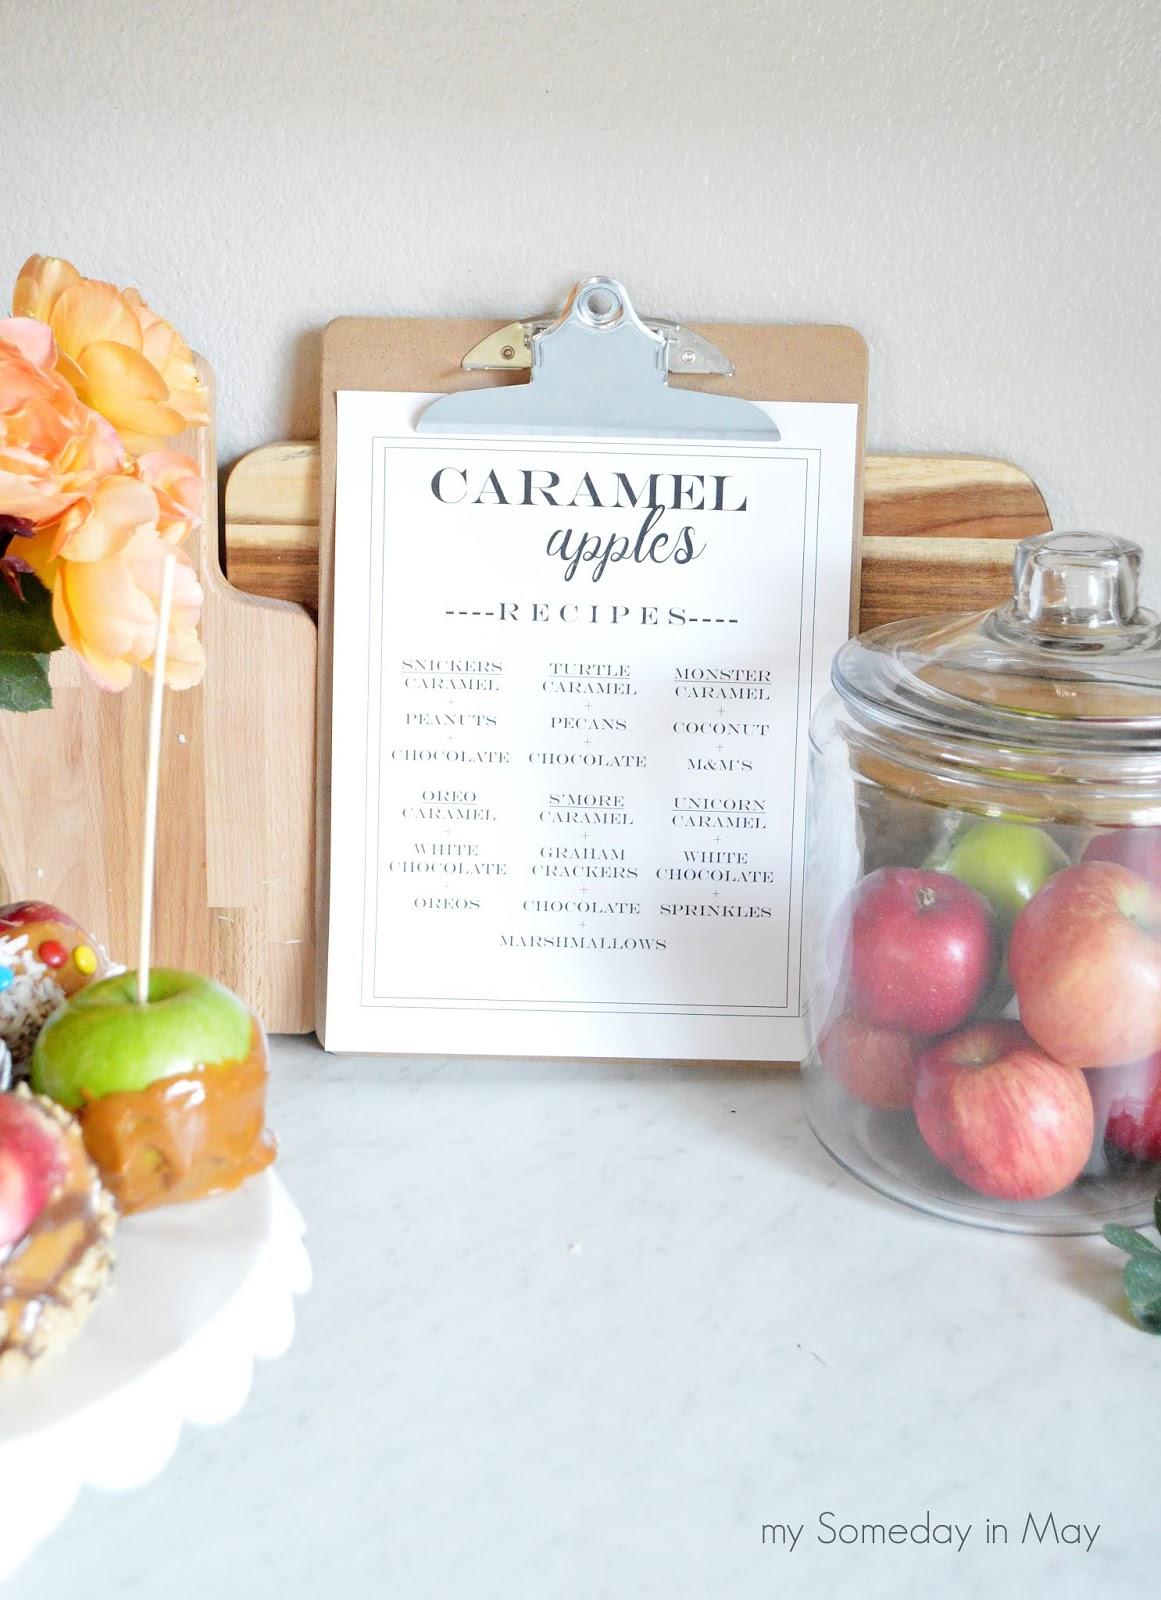 Caramel Apple Recipes Printable